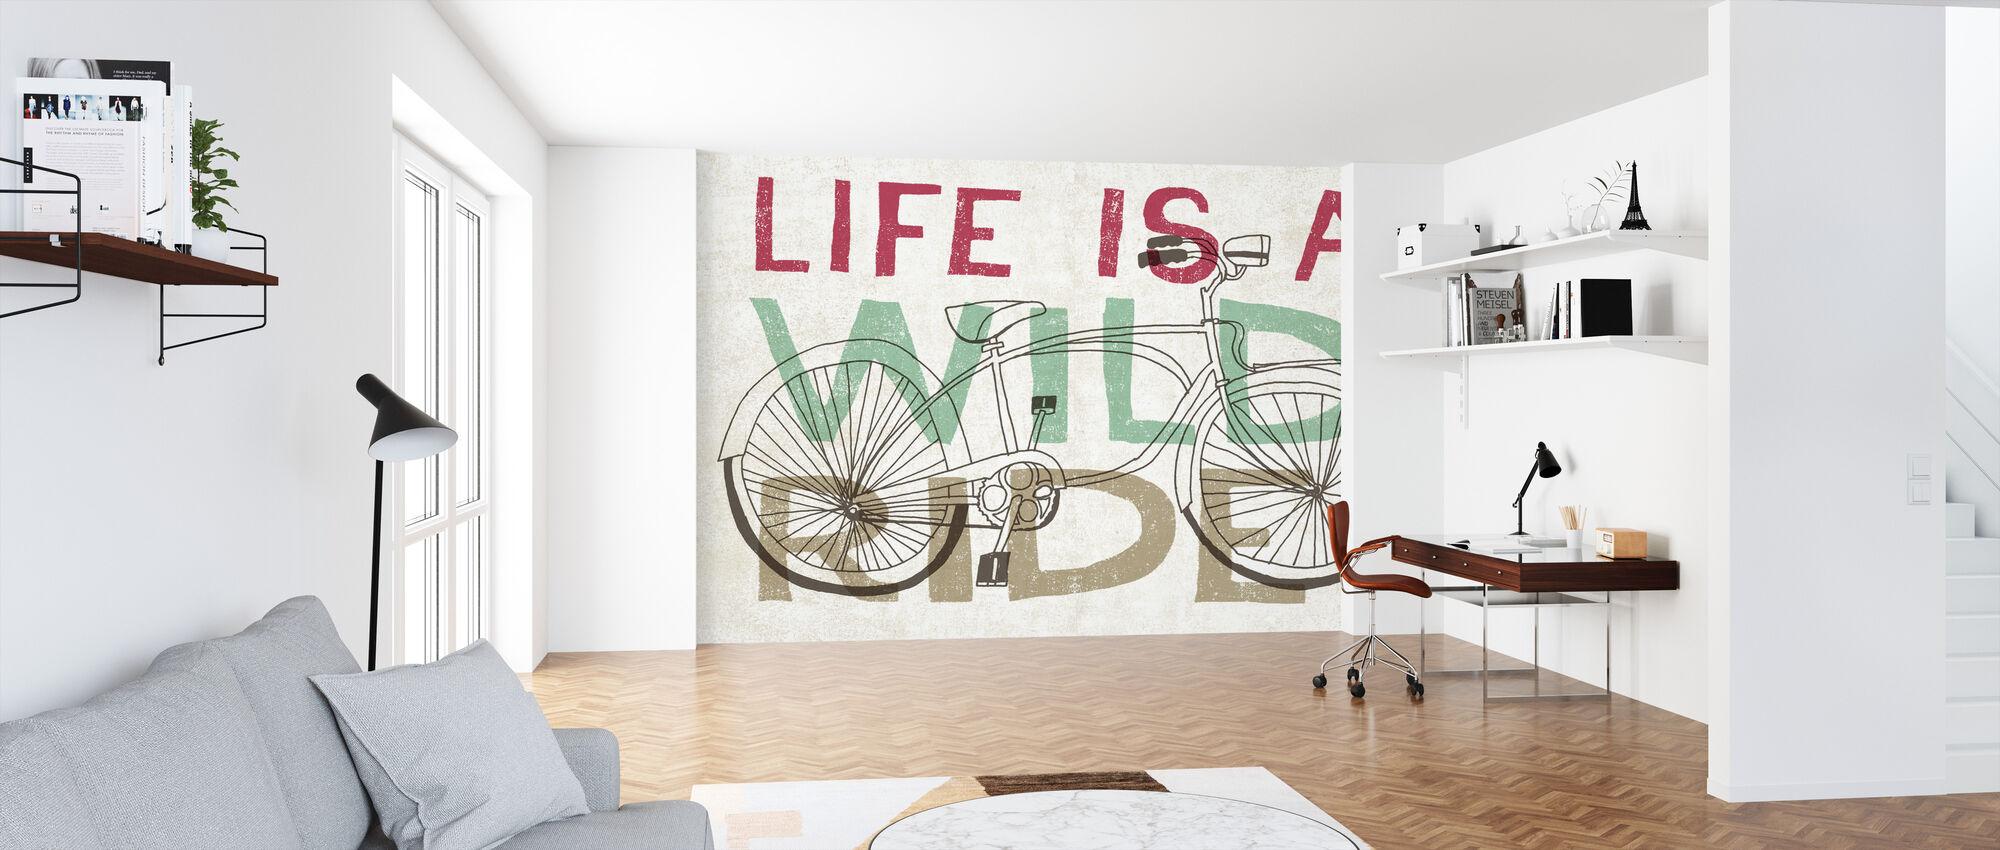 Road Trip - Wild Ride - Wallpaper - Office